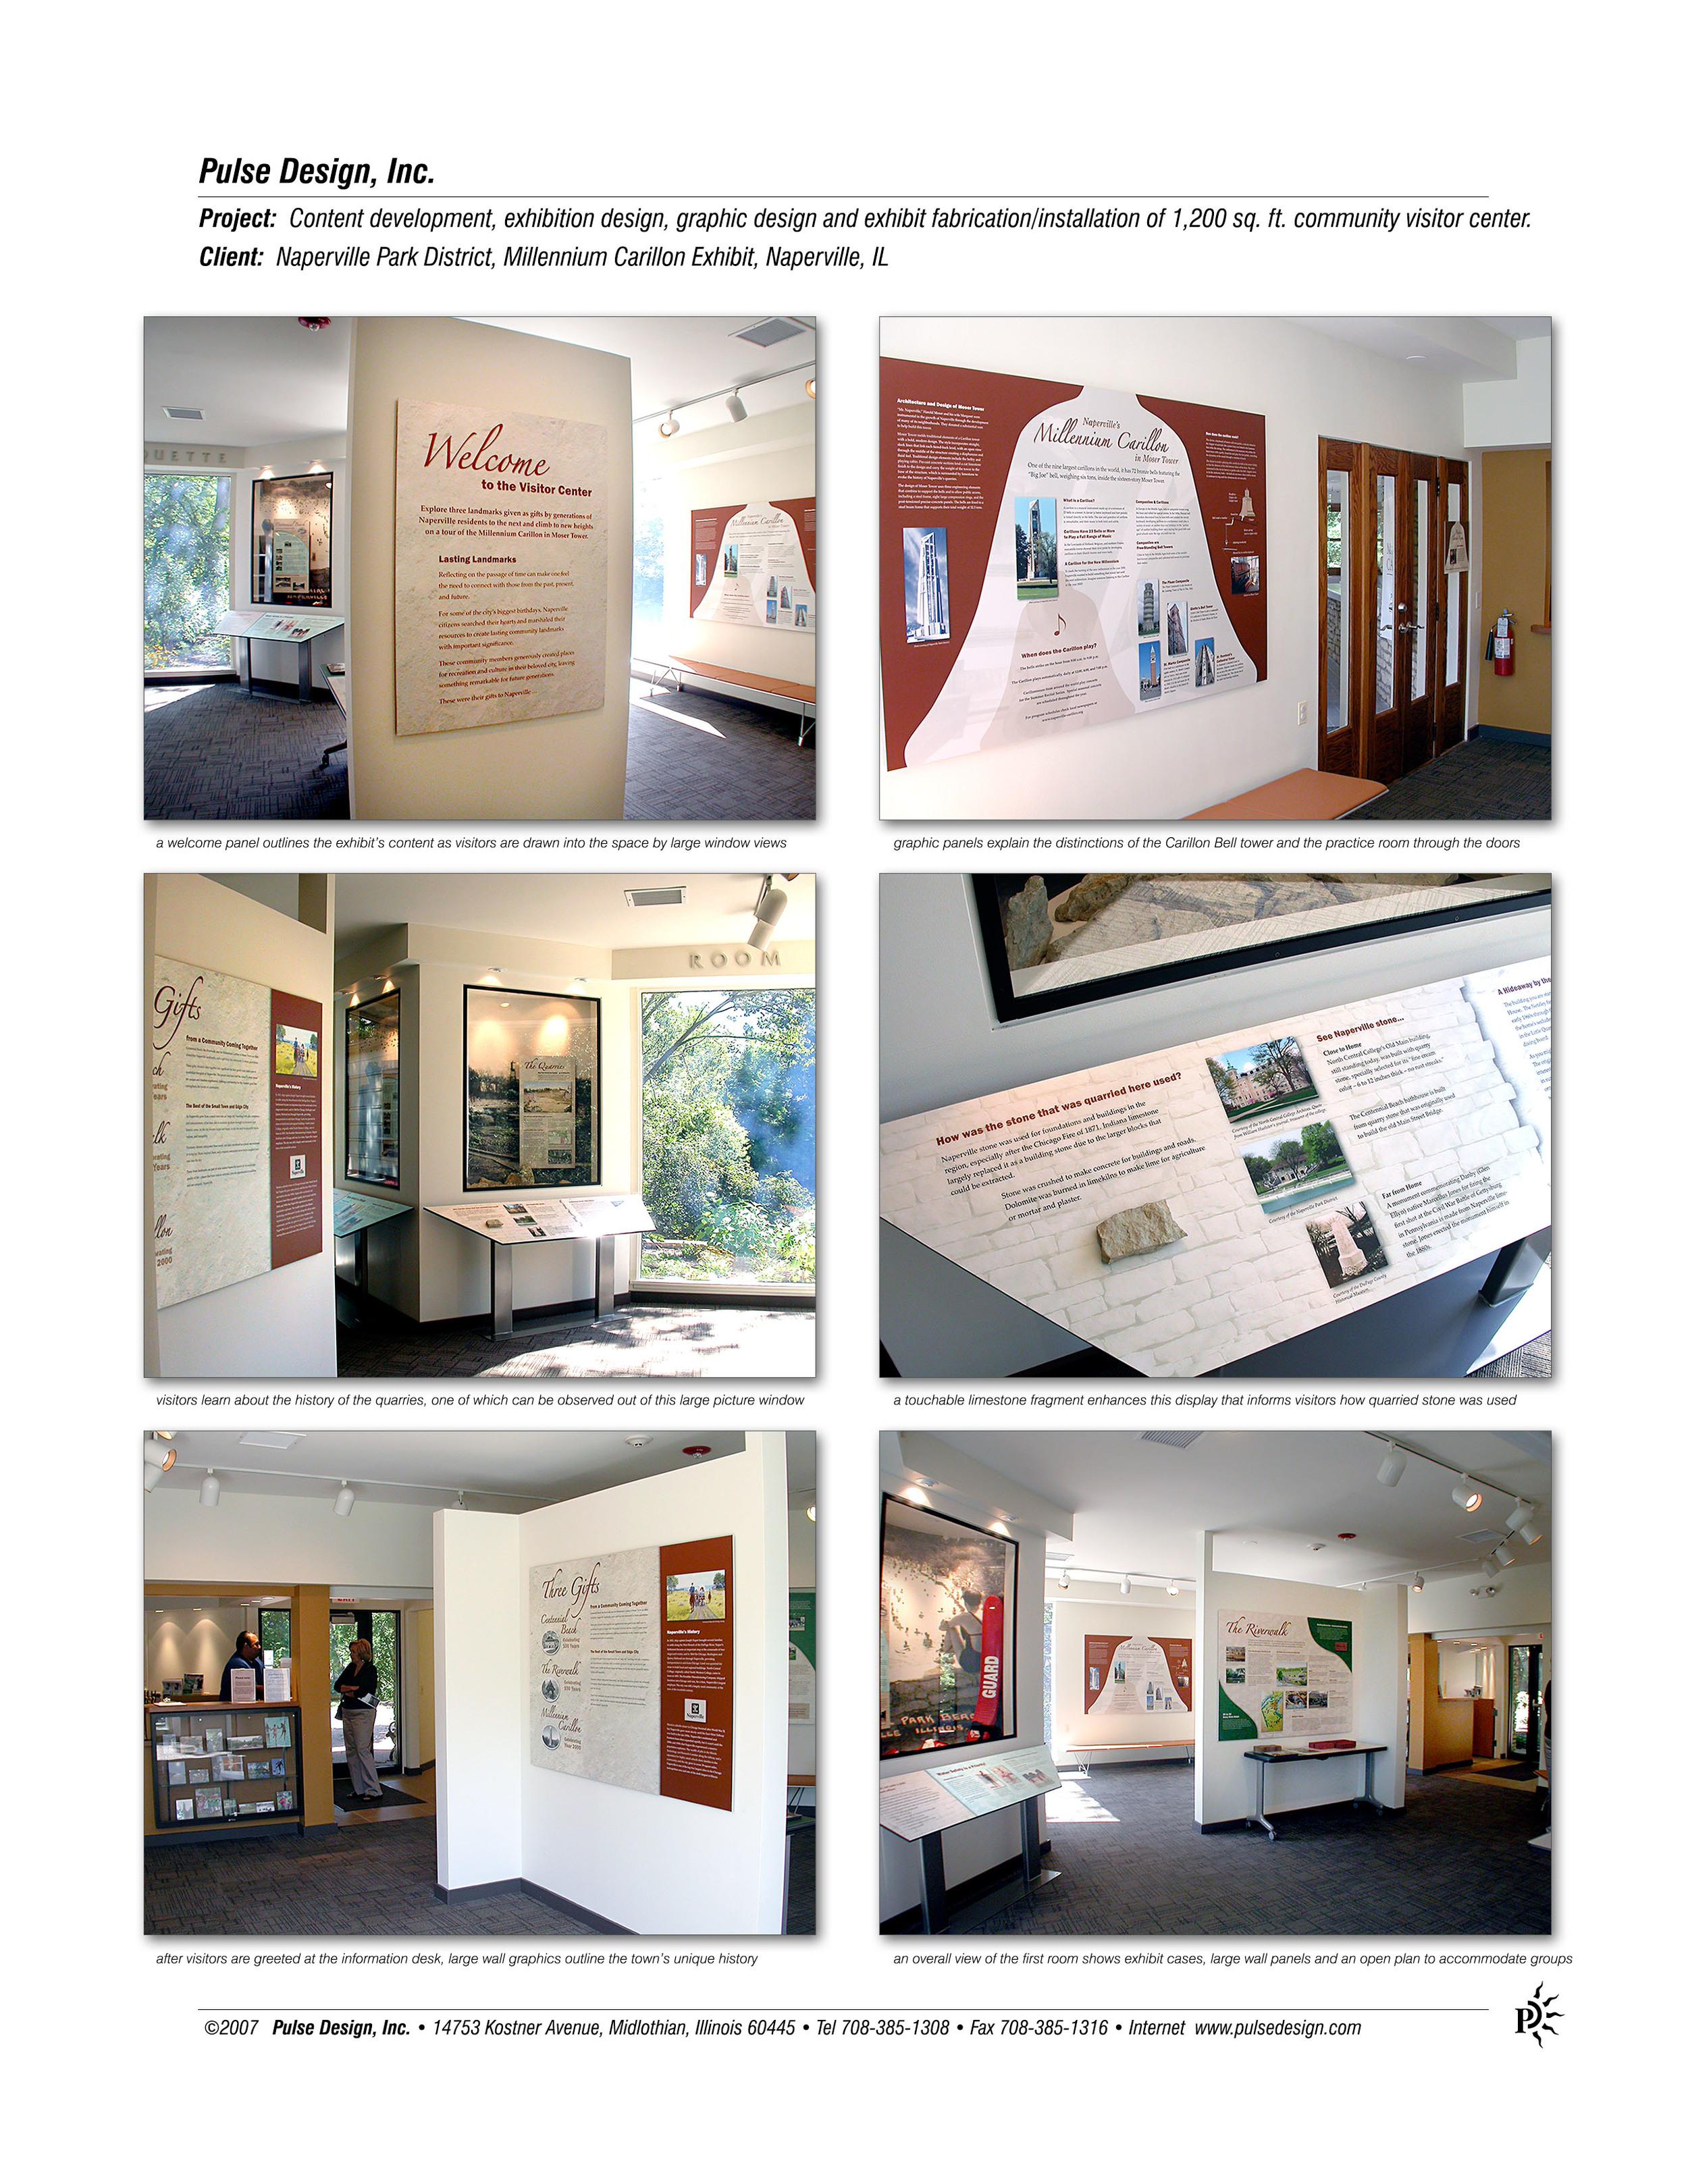 Naperville-Carillon-Exhibit-Photos-1-Pulse-Design-Inc.jpg